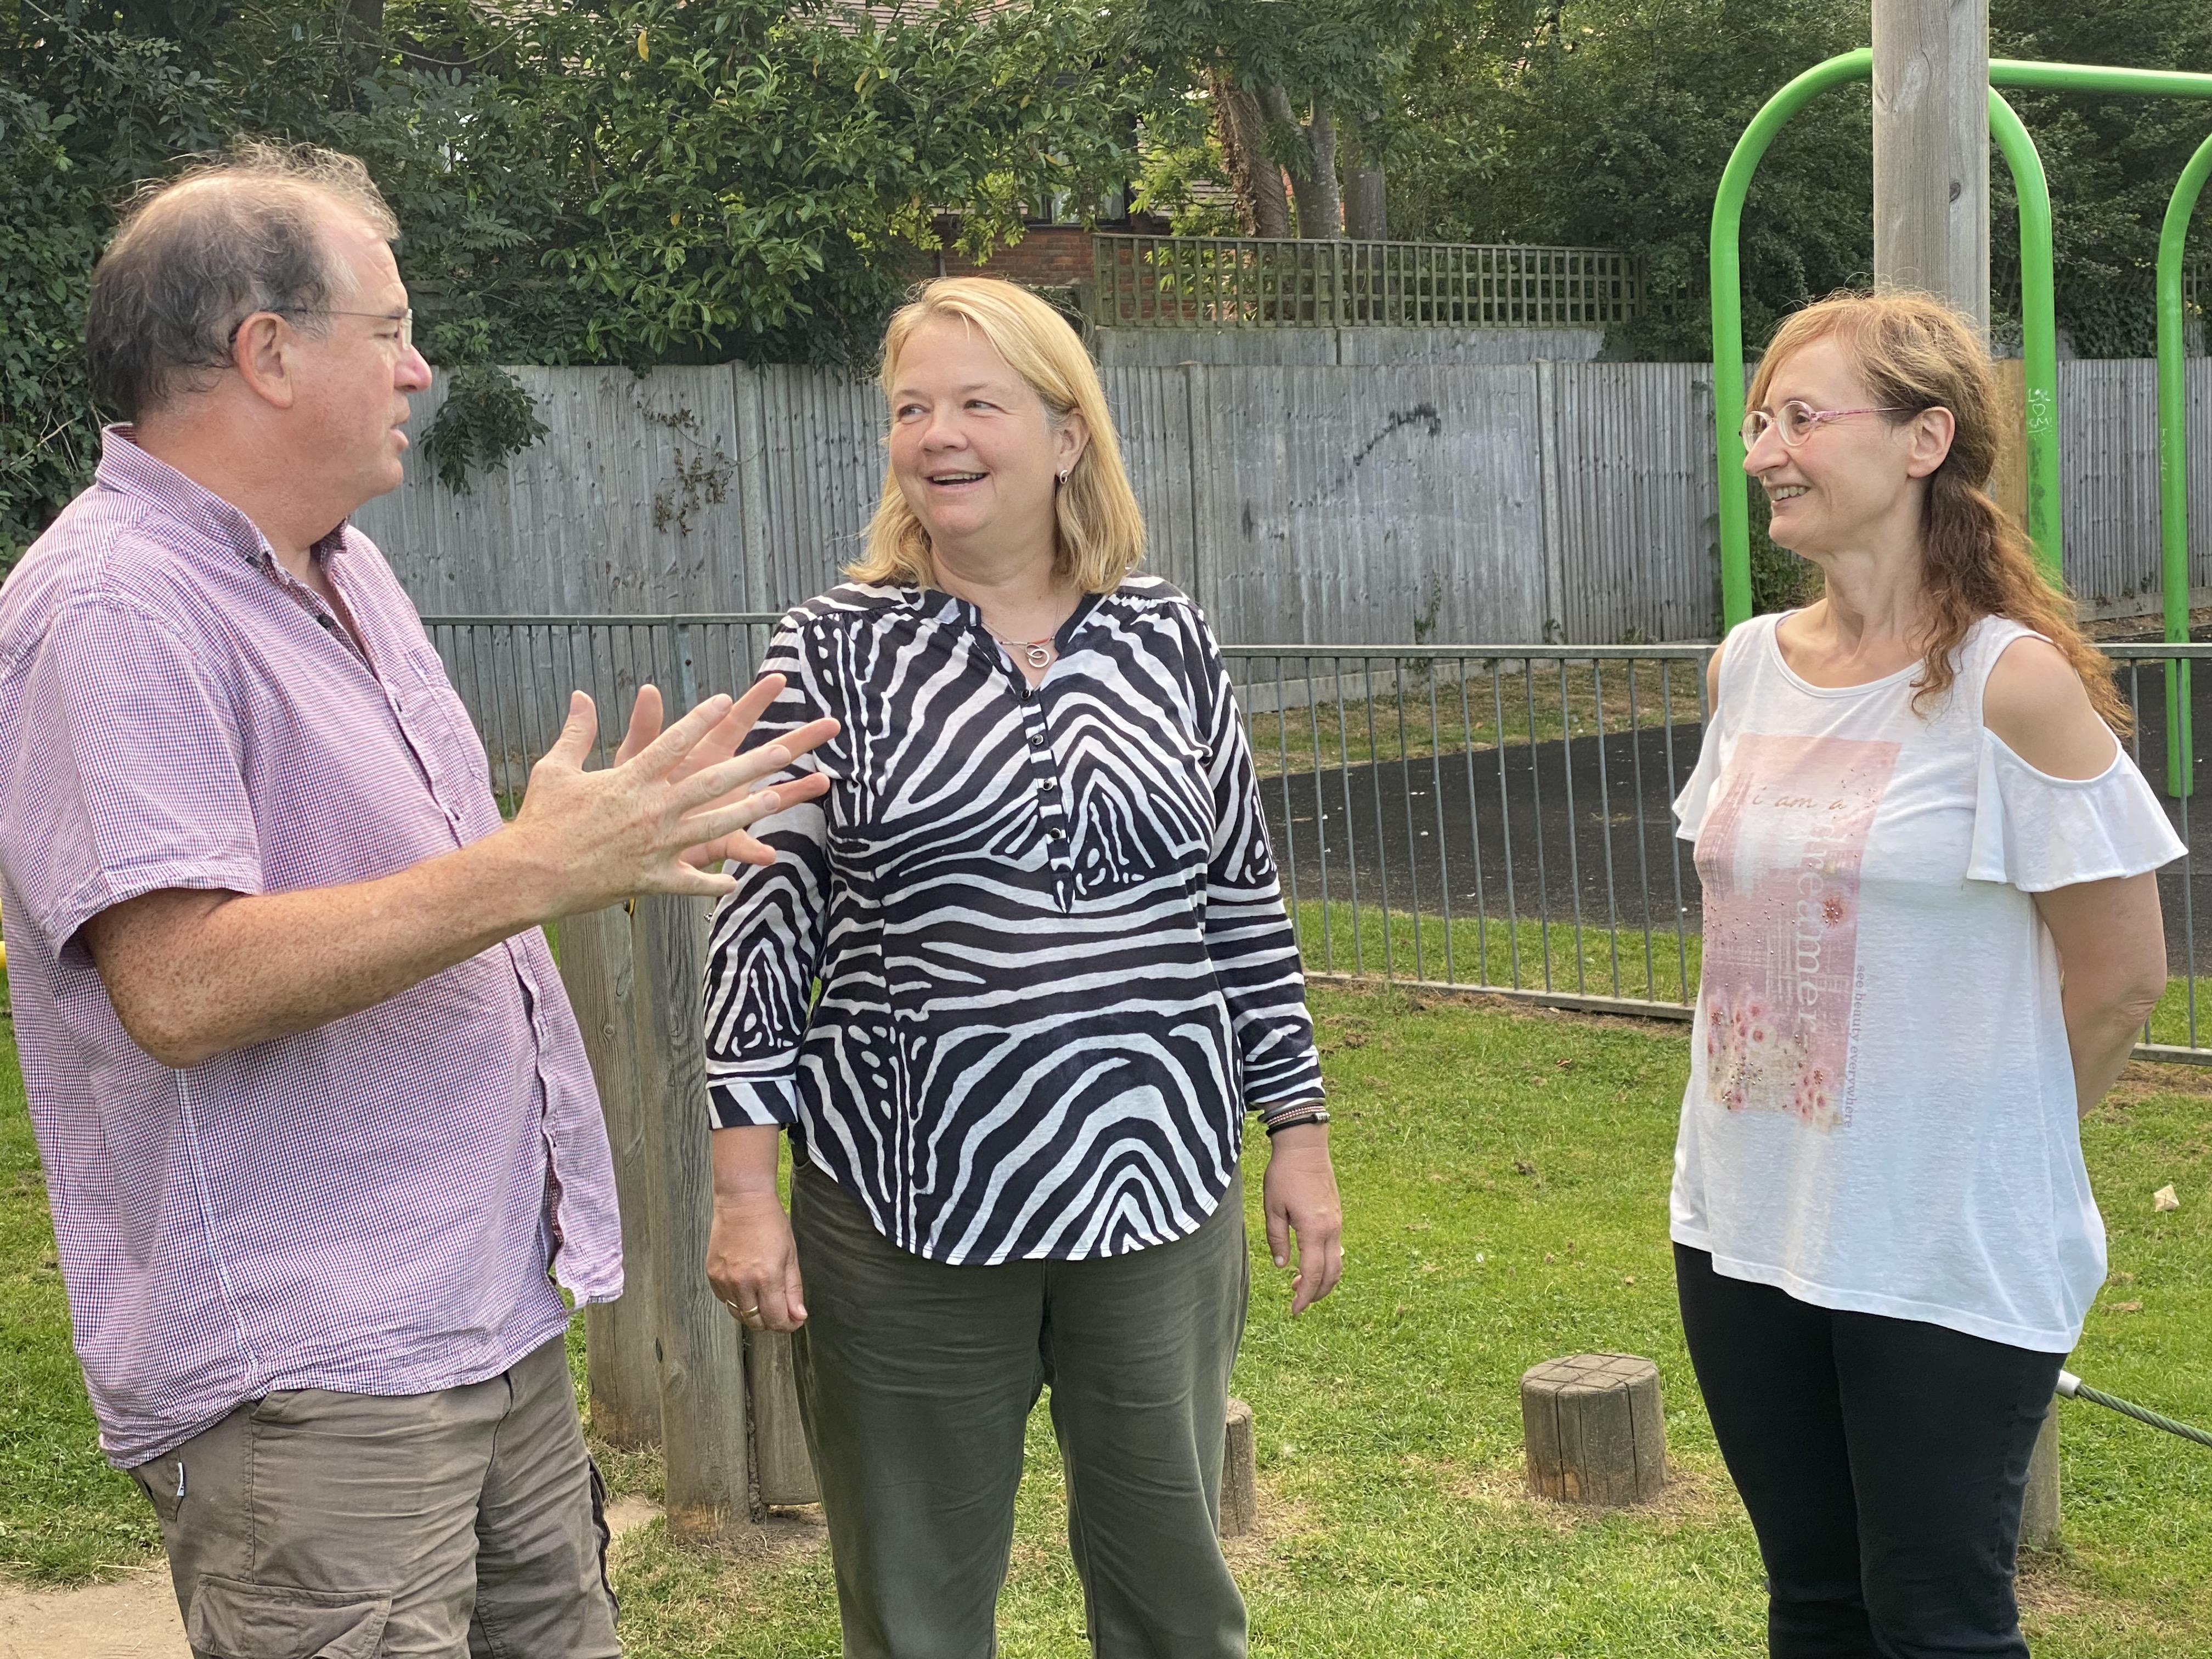 Candidate Jane Ainslie (centre) discusses local issues with LibDem Wescott Town Councillors Mariangela Ferrai and Pete Dennis